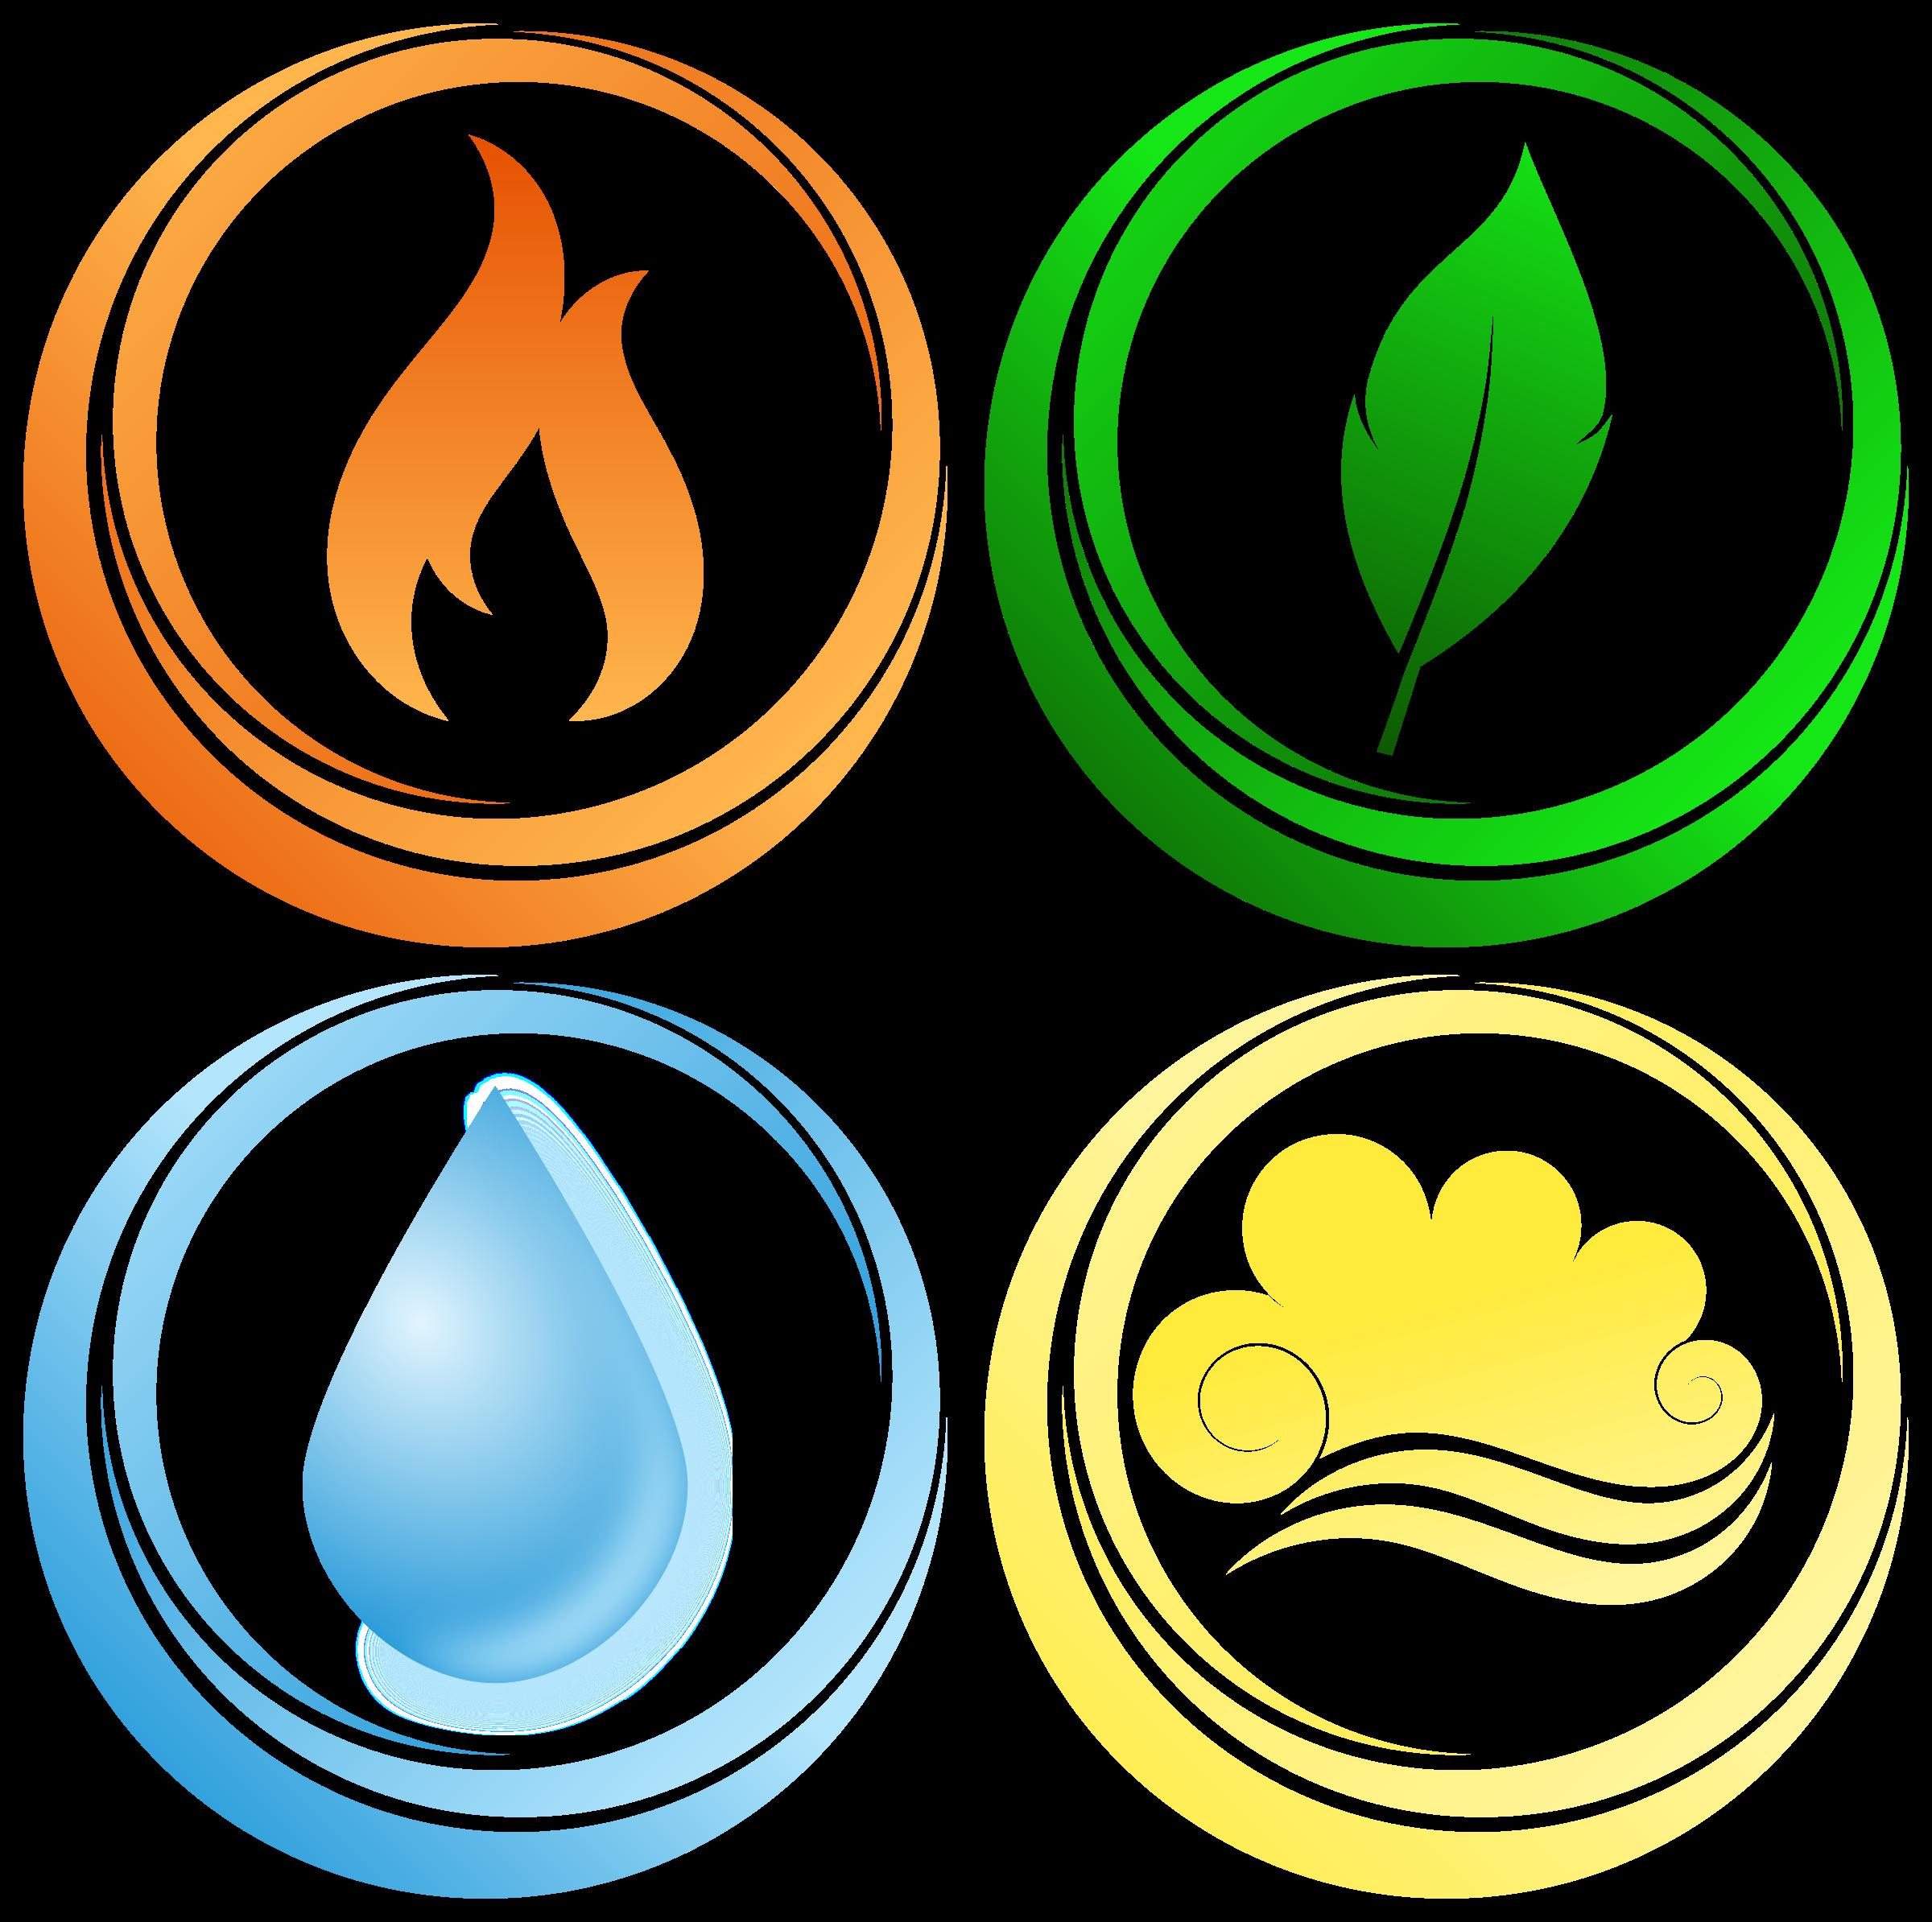 Love clipart icon. Symbols of the four